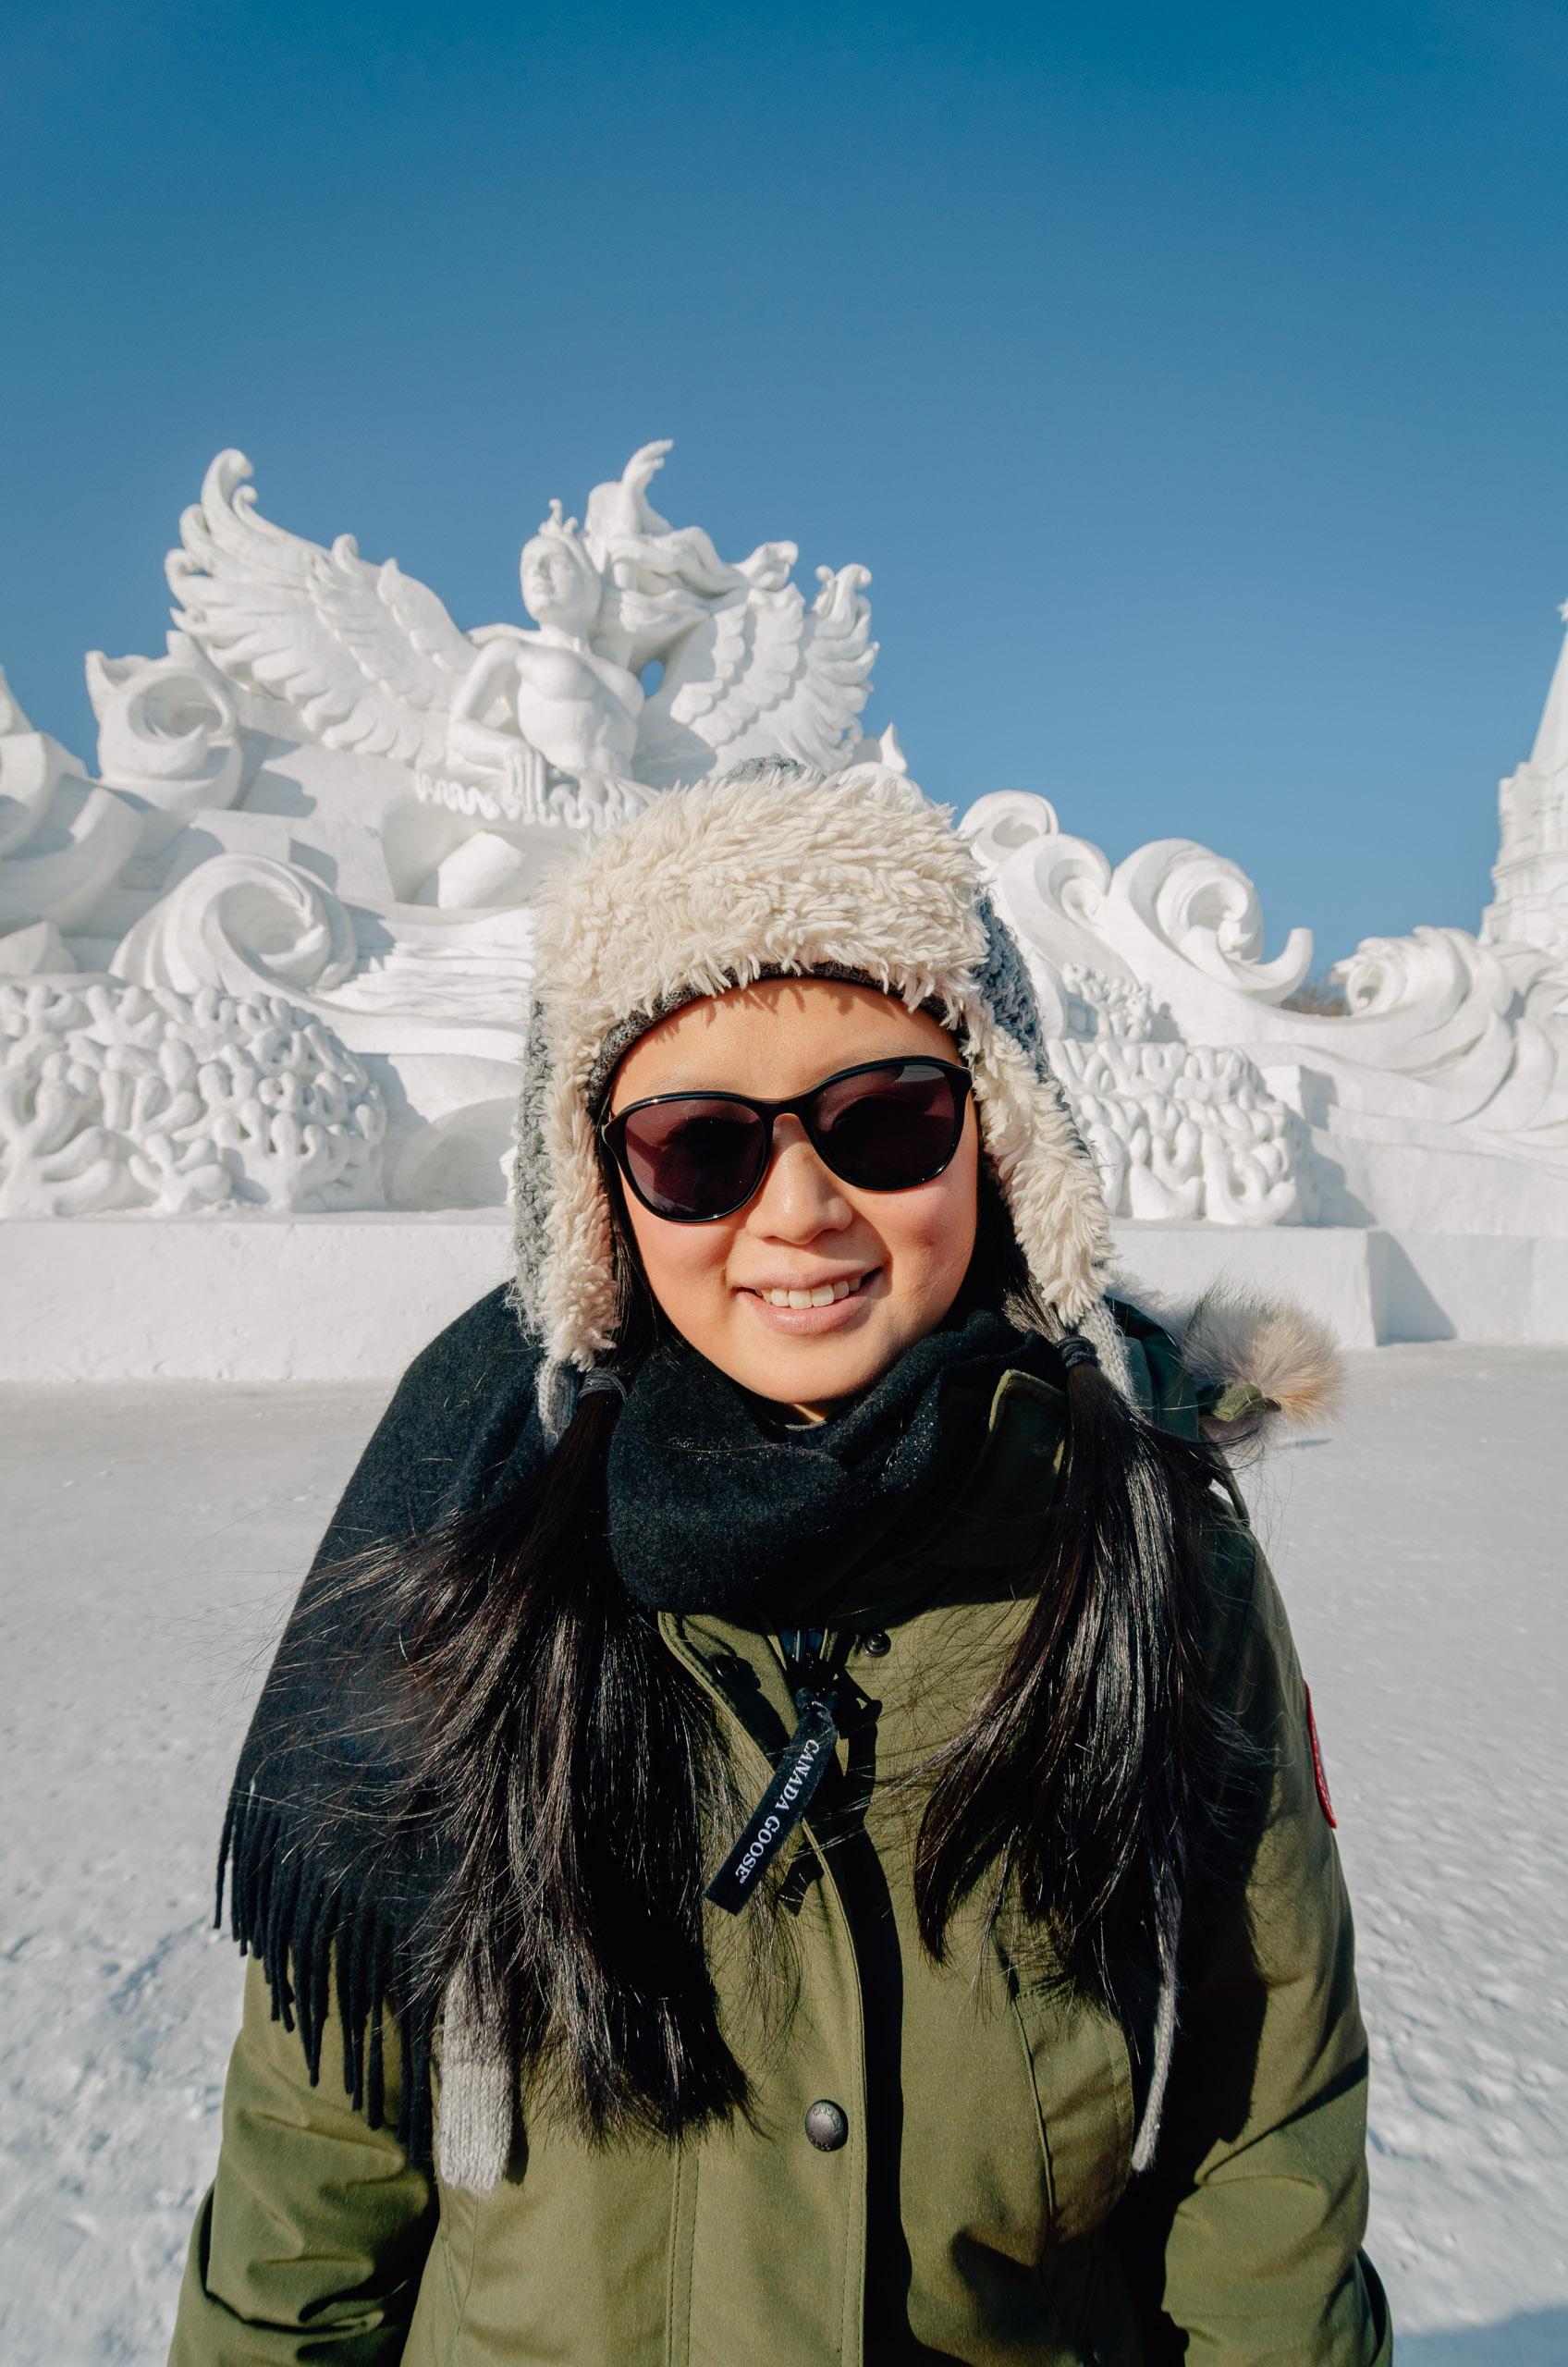 Harbin China Ice Festival - 2012-0108-DSC_2122_60965